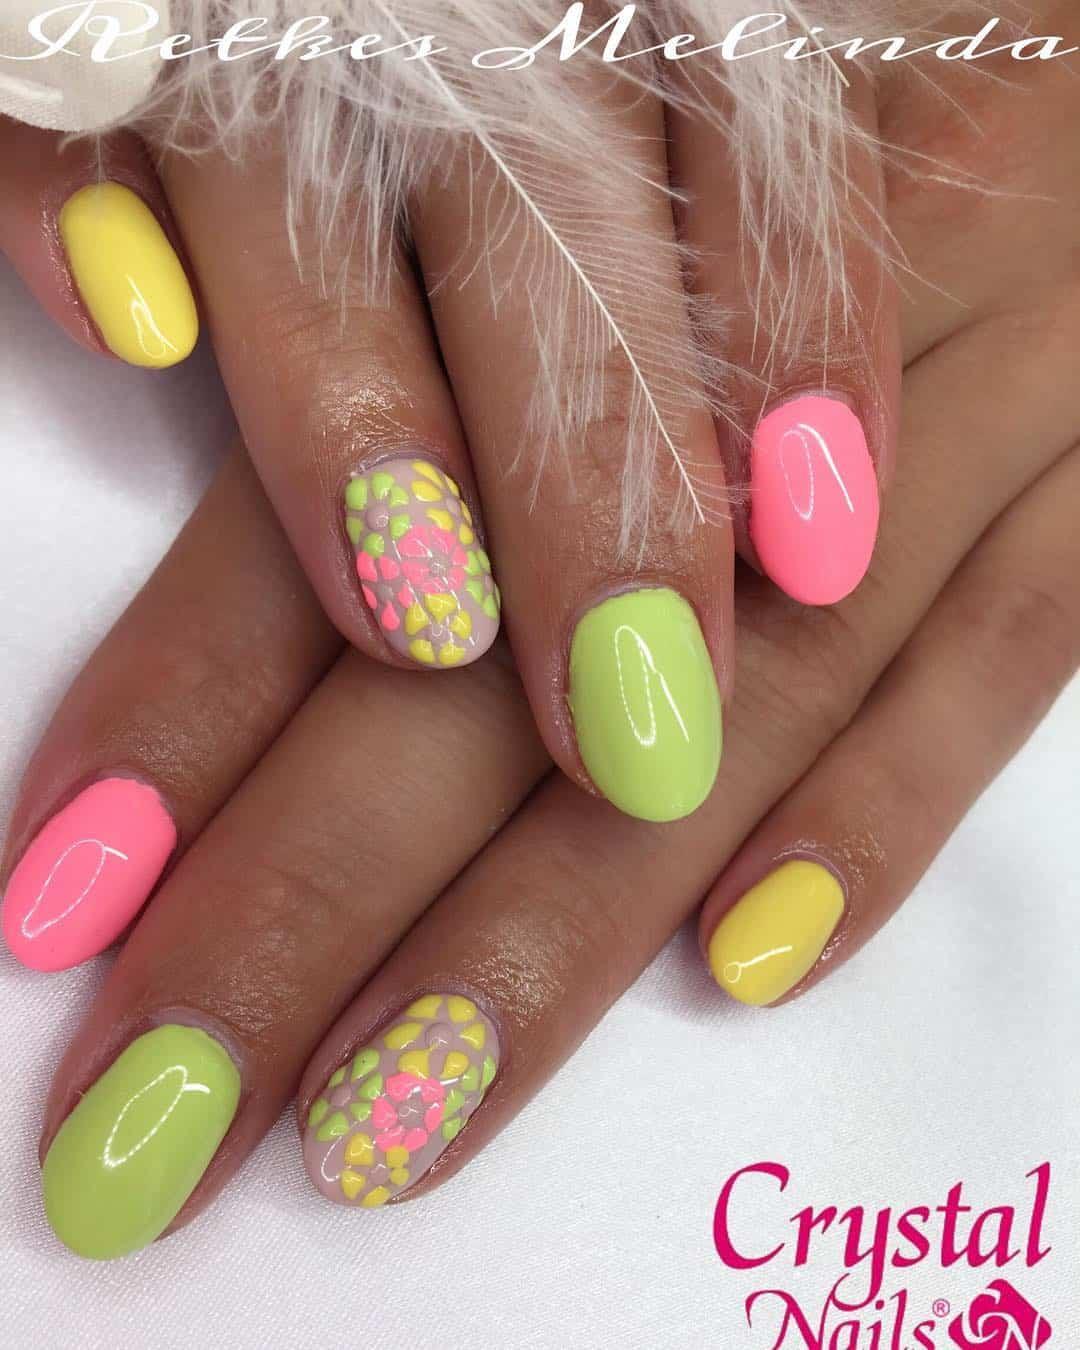 20 Neon Nail DesignsFor A Burst Of Bright Colors